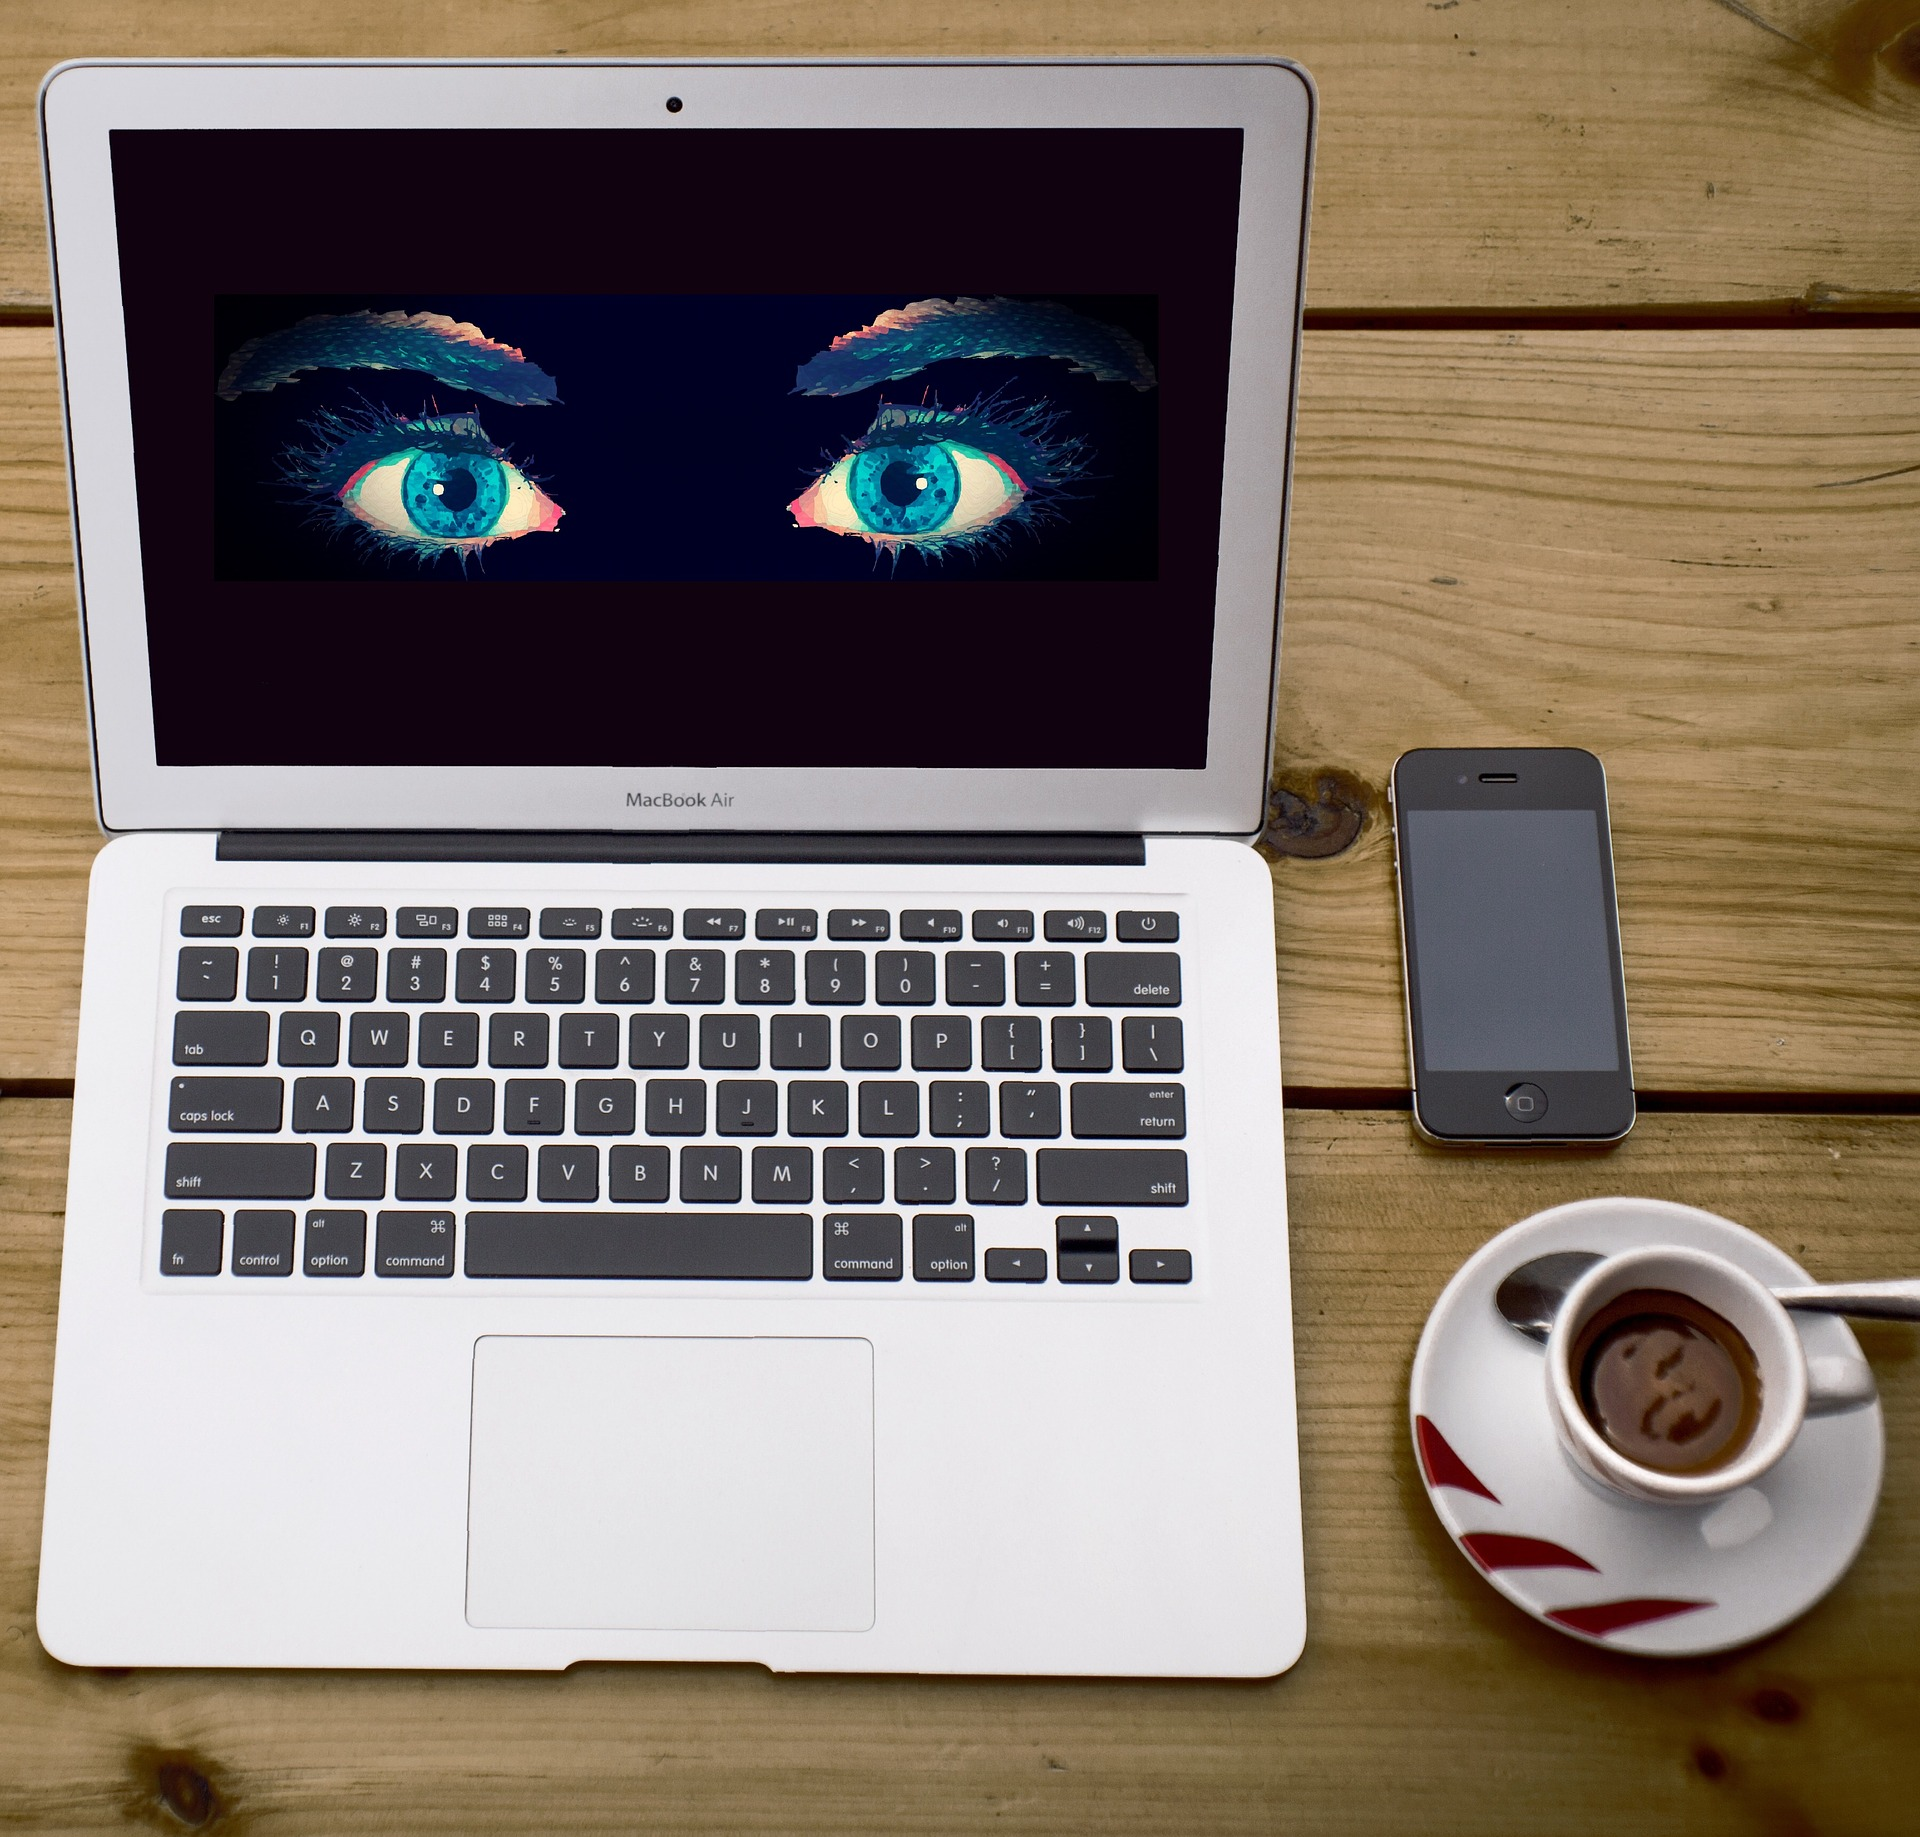 Espionnage via un MacBook et un smartphone